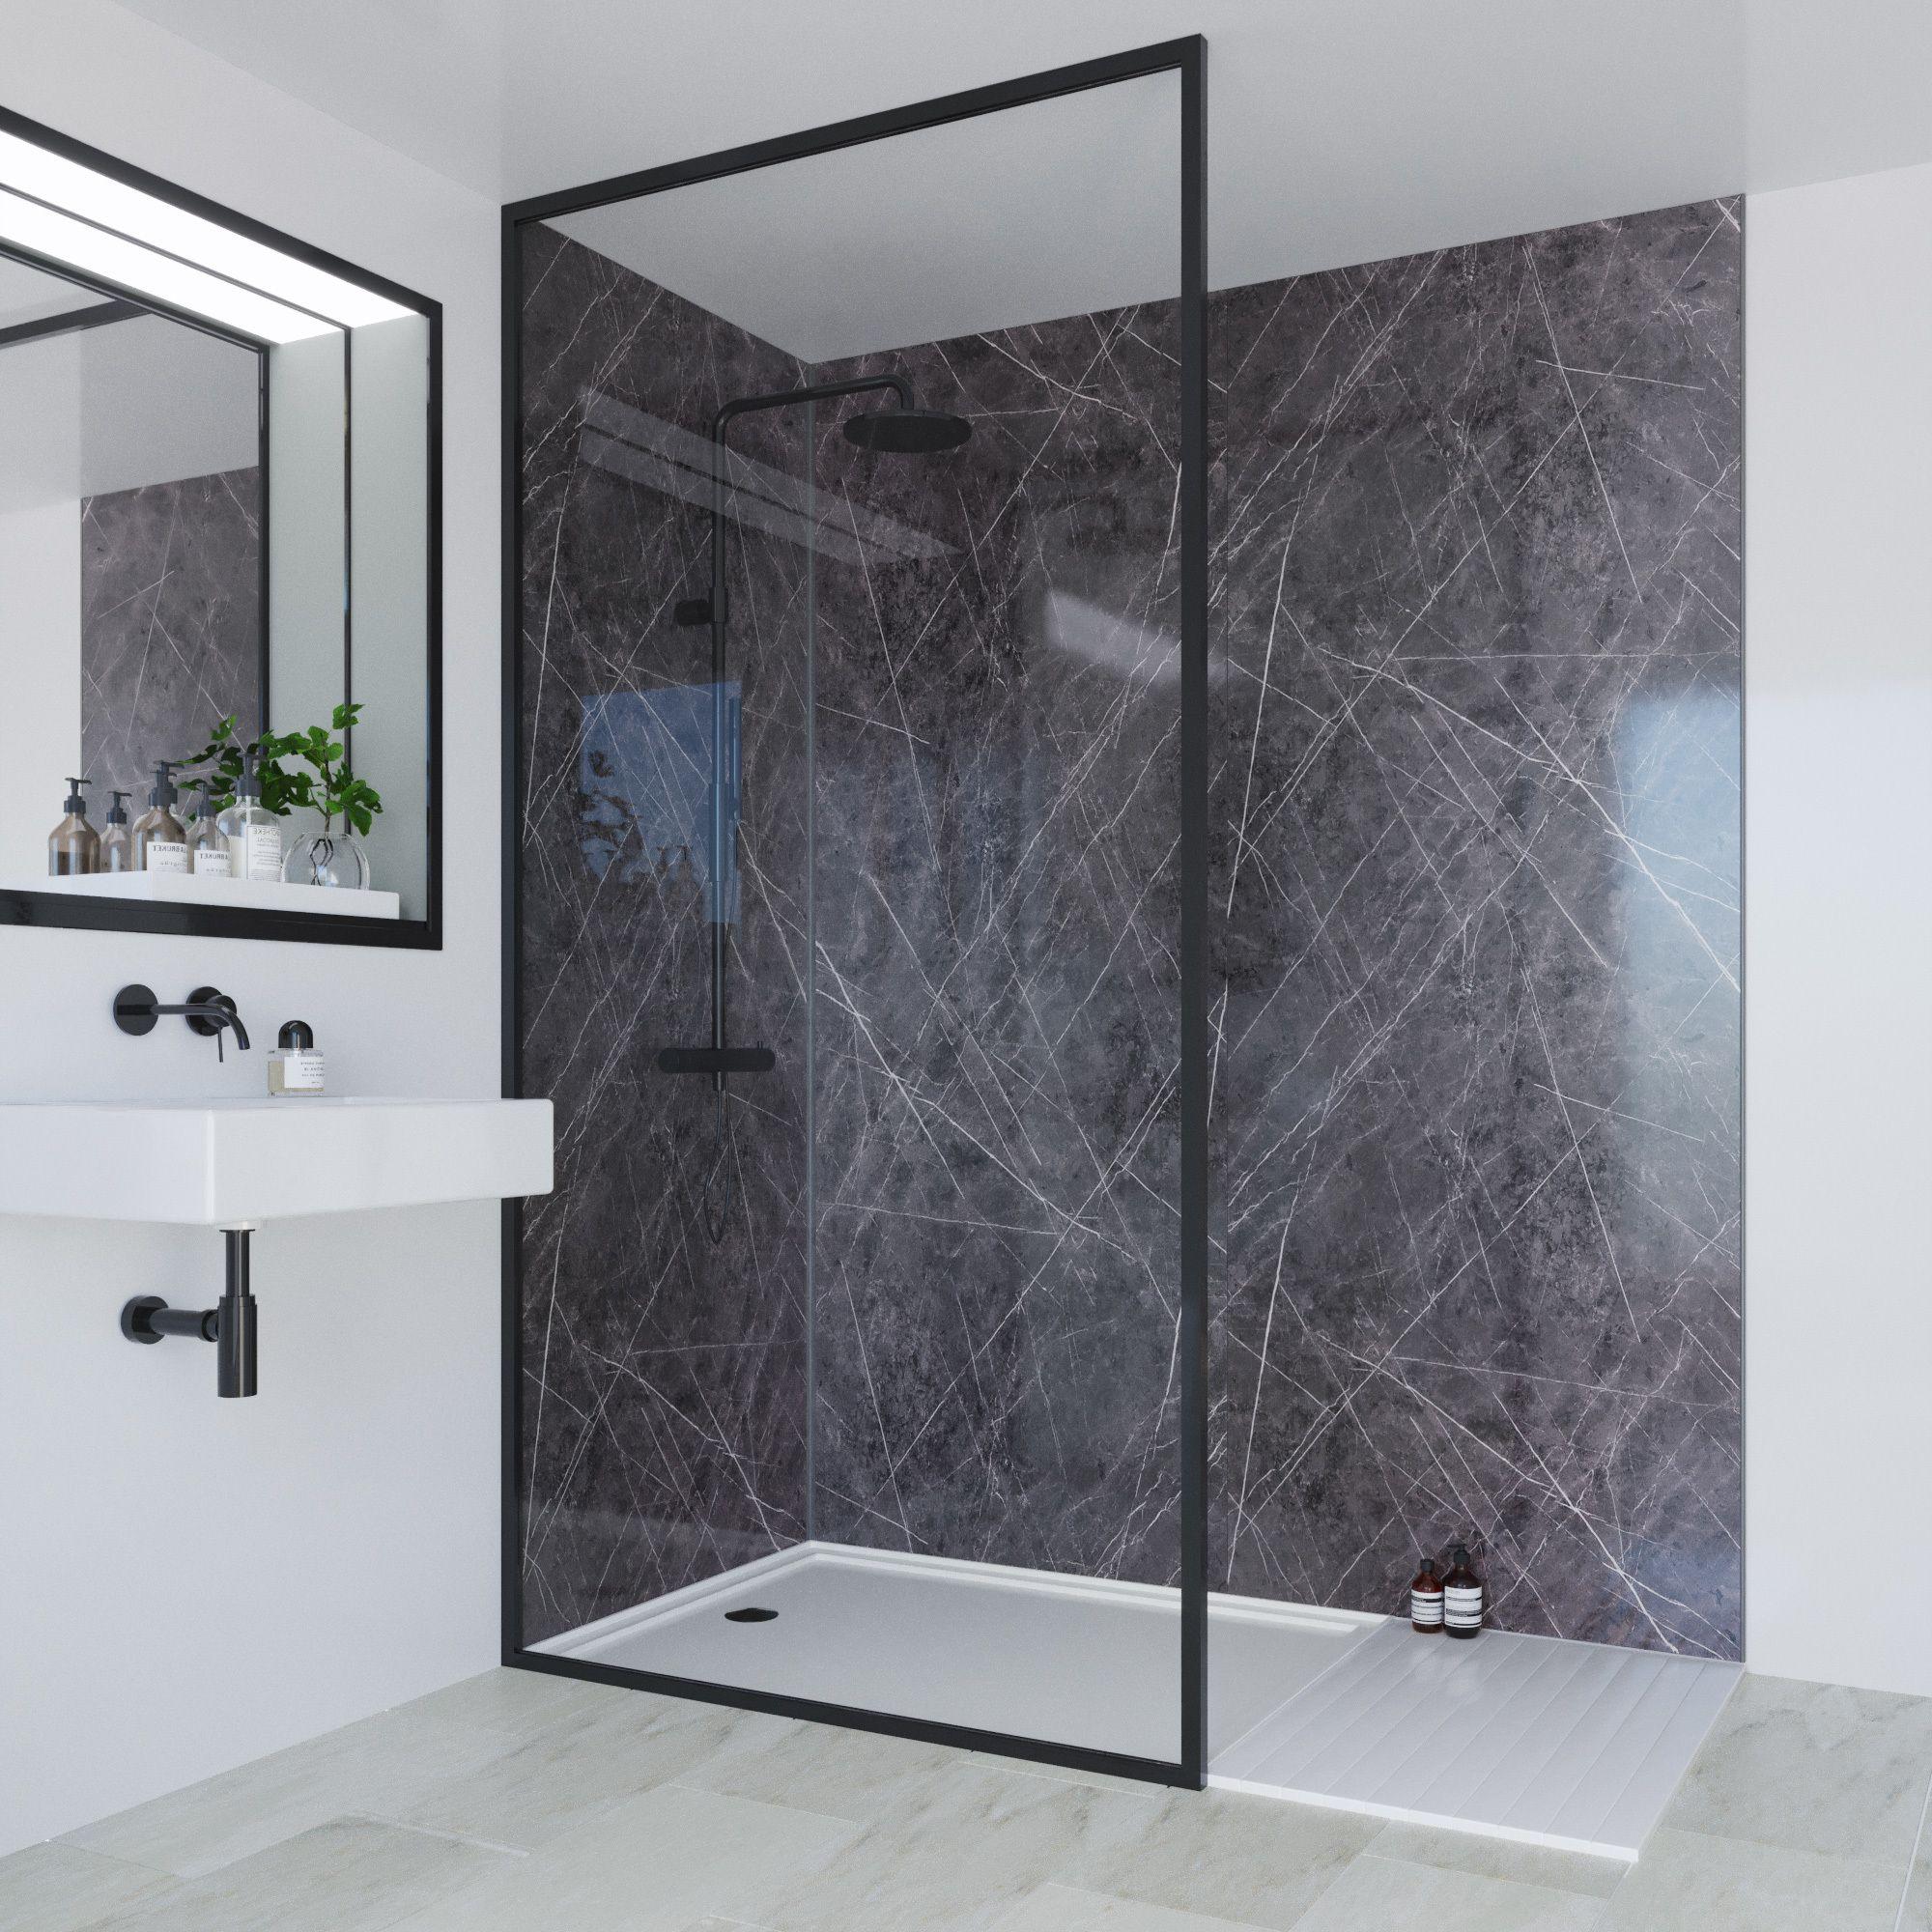 Multipanel Linda Barker Ferro Grafite 1200mm 900mm Sides Solution For Corner Installations 2 Walls Bathroom Wall Panels Unique Bathroom Bathroom Wall